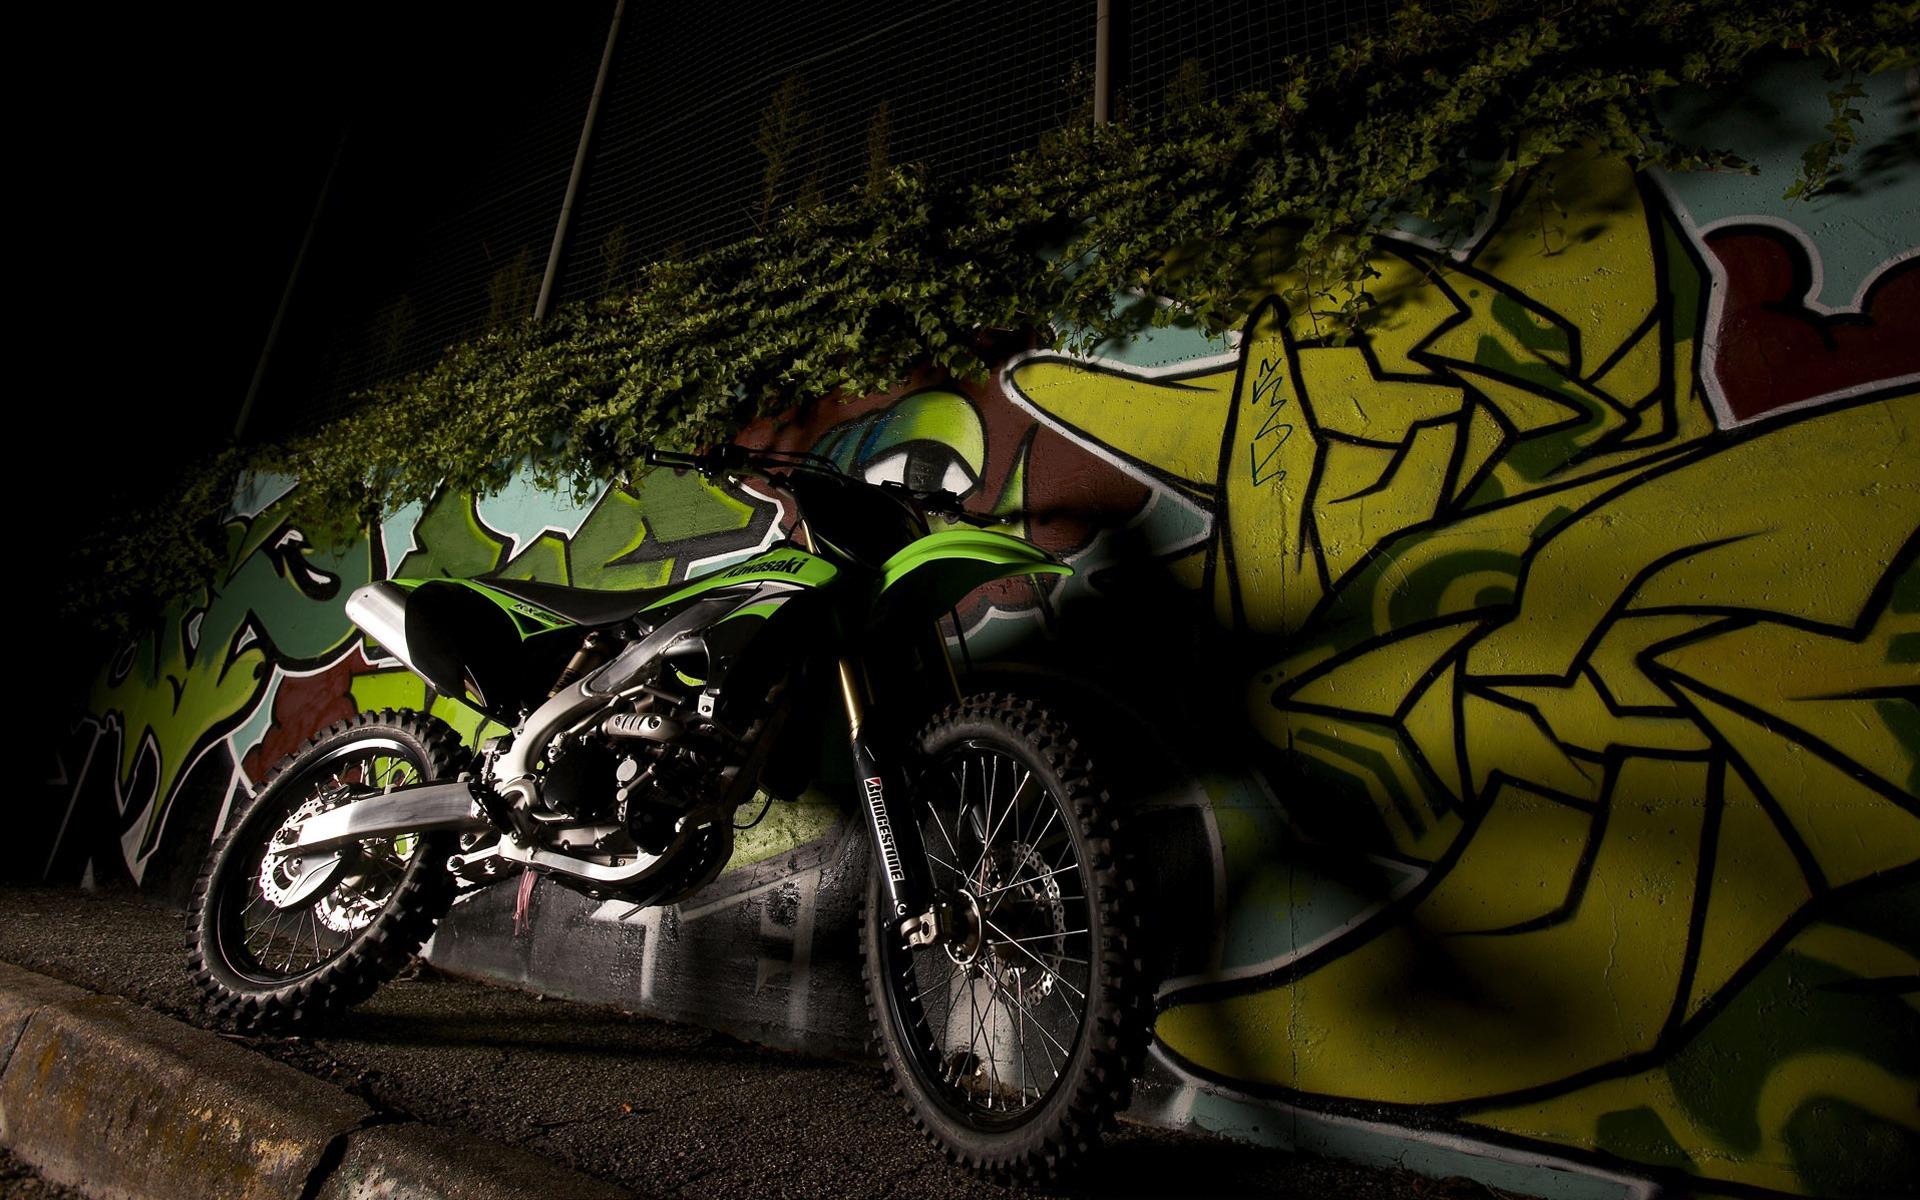 kawasaki motorcycle high definition wallpapers cool desktop background photographs widescreen